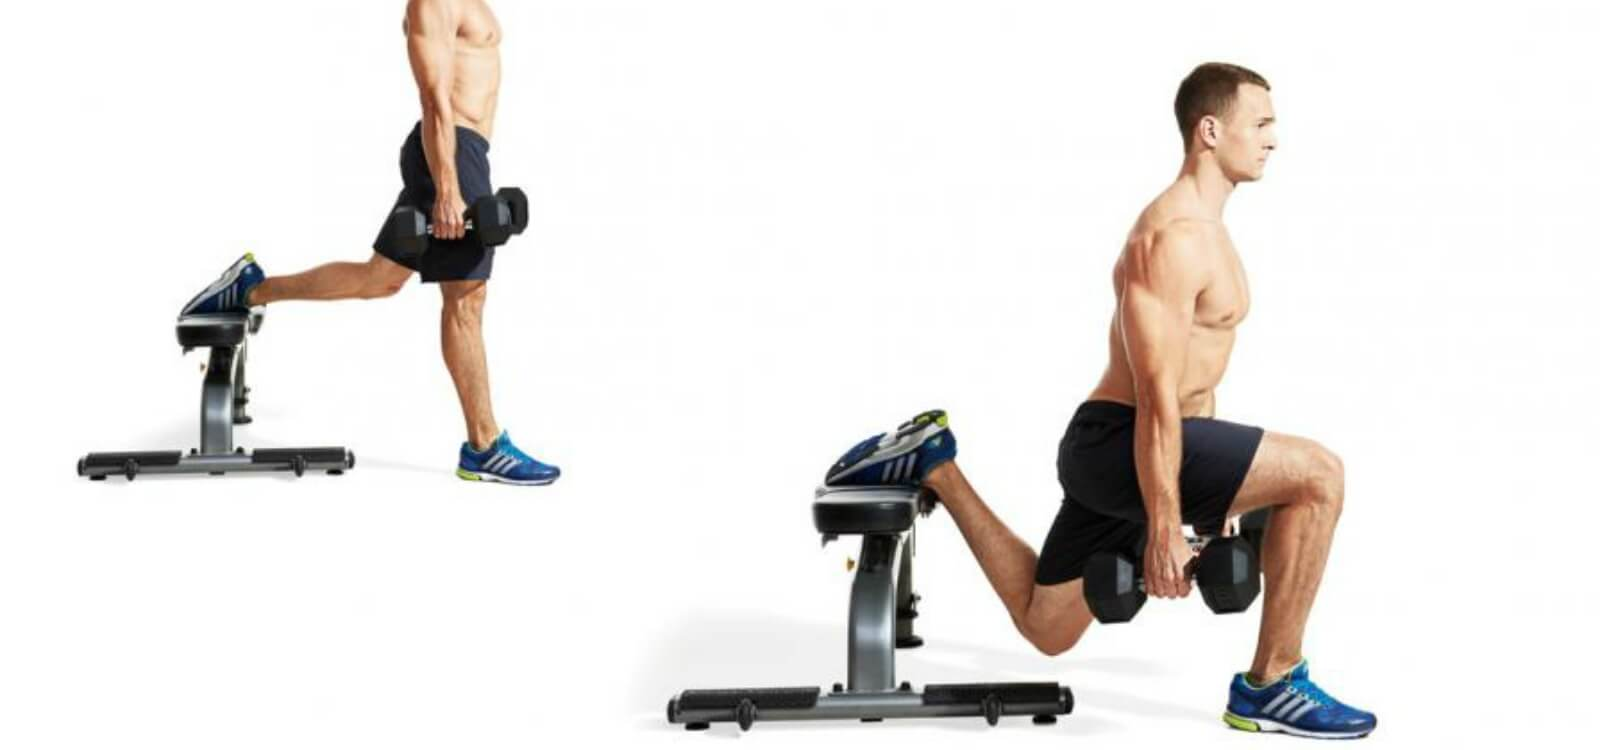 bulgarian split squat stance